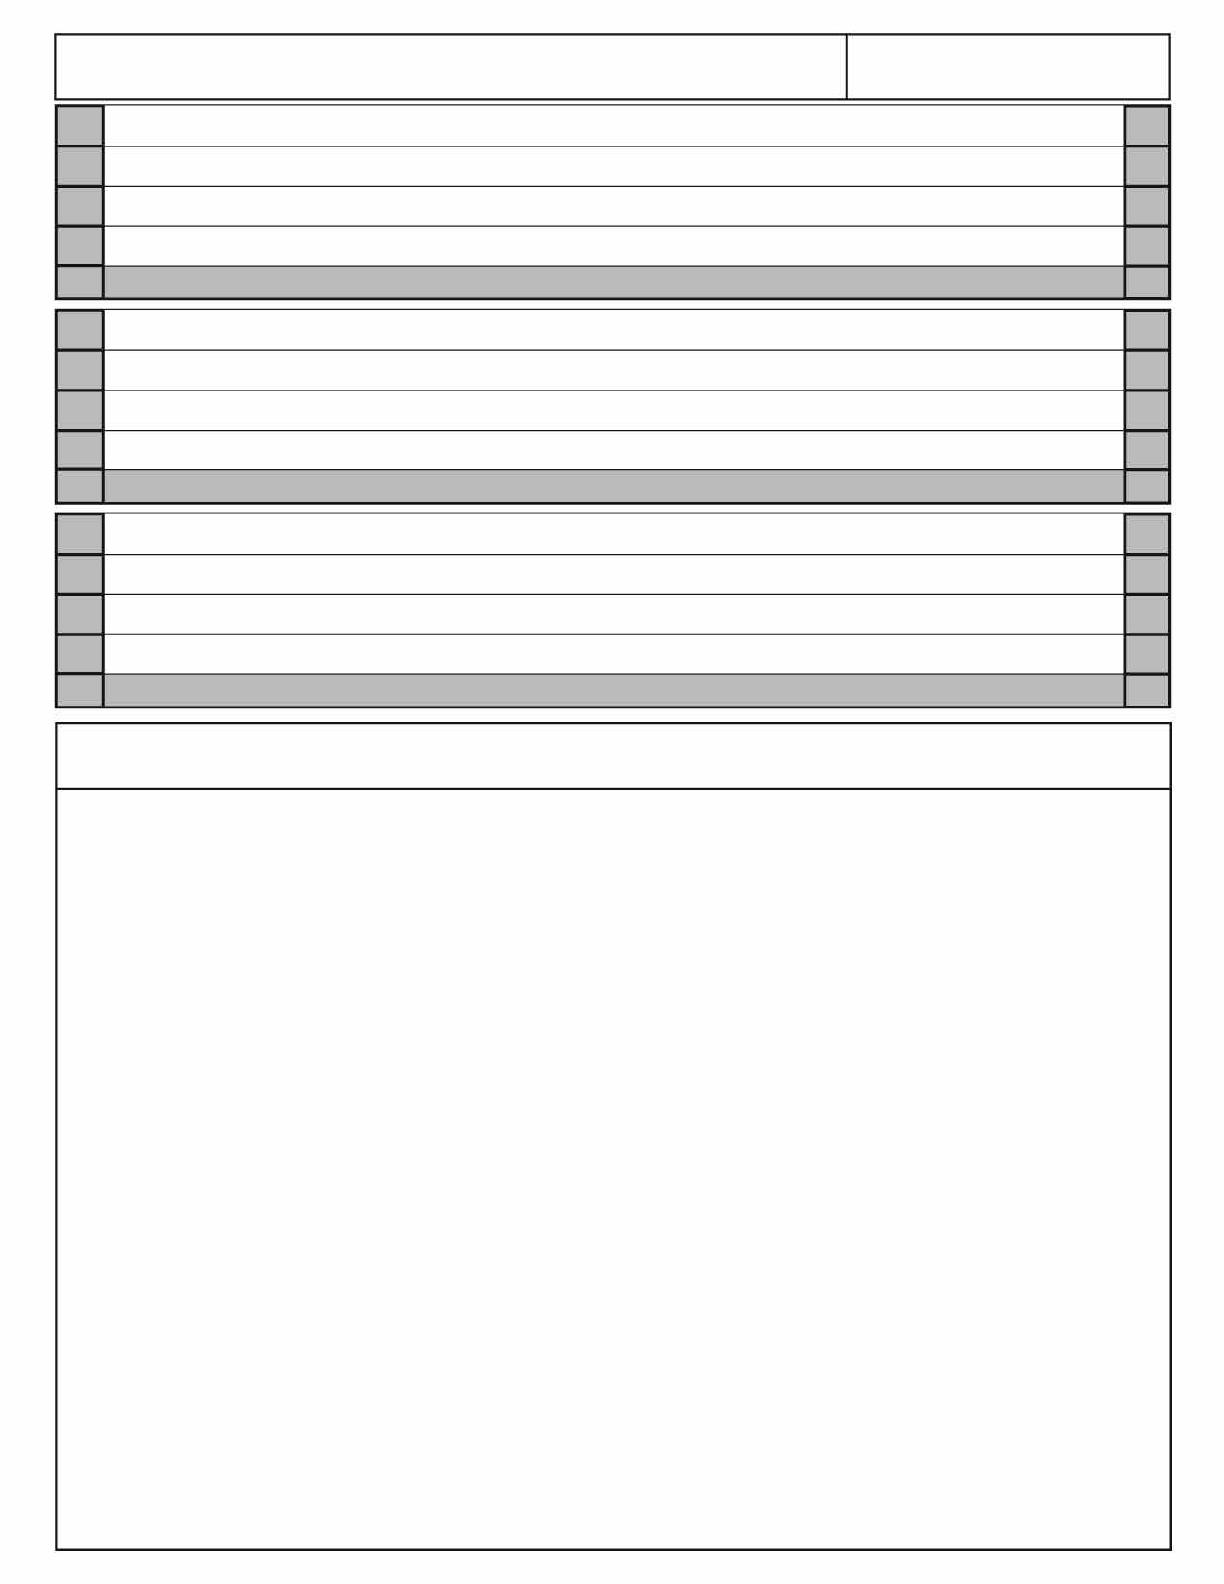 Free Printable Dollar Tree Job Application Form Page 2 - Free Printable Dollar Tree Application Form